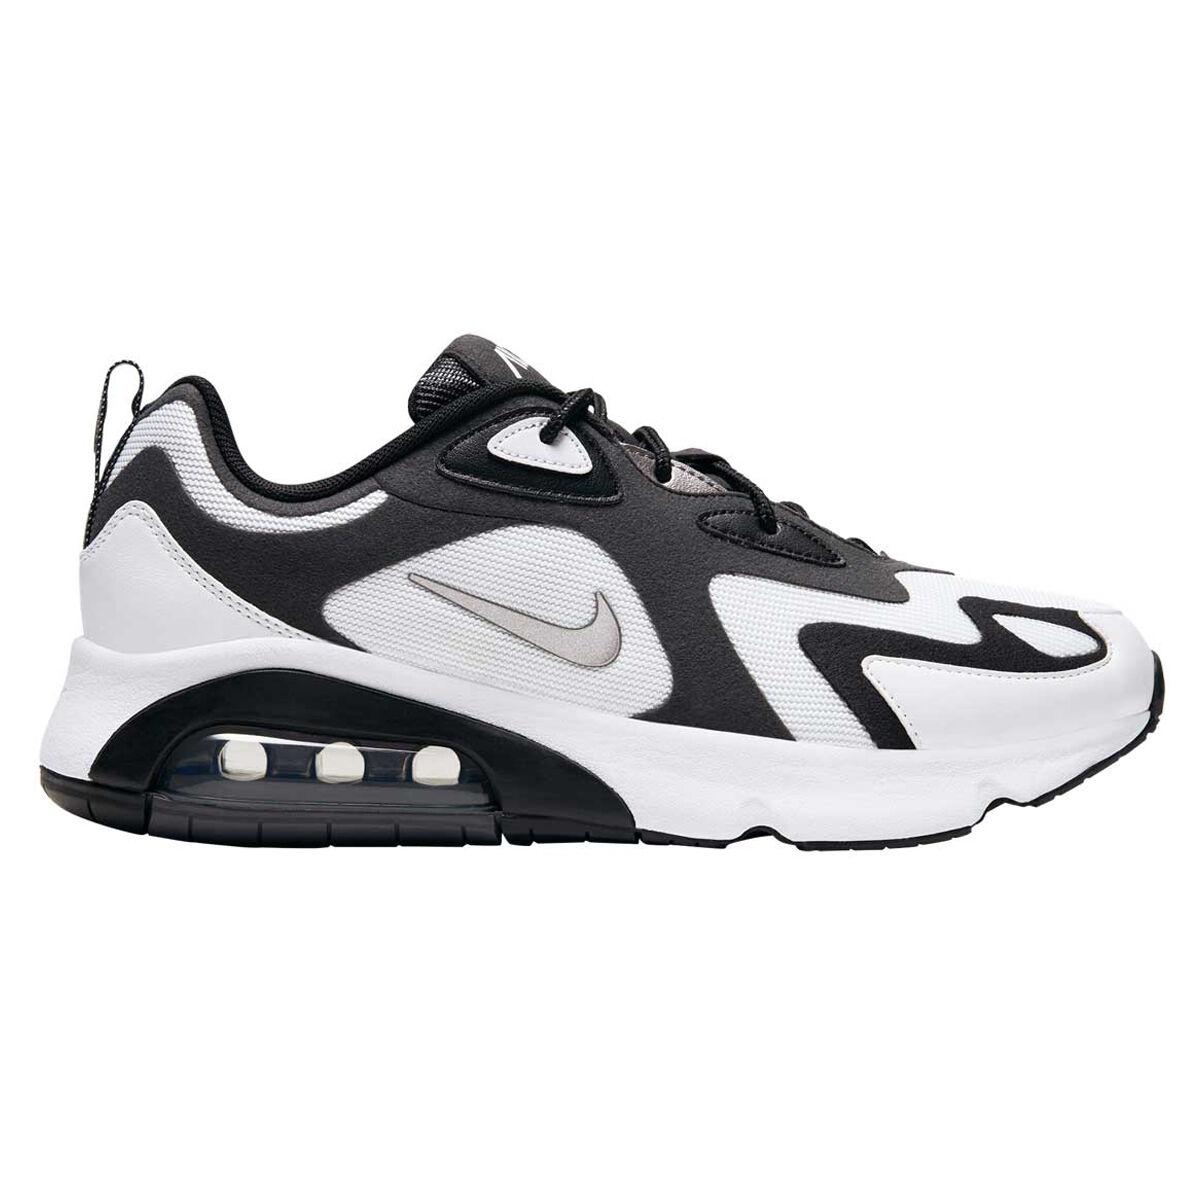 Nike Air Max 200 Mens Casual Shoes